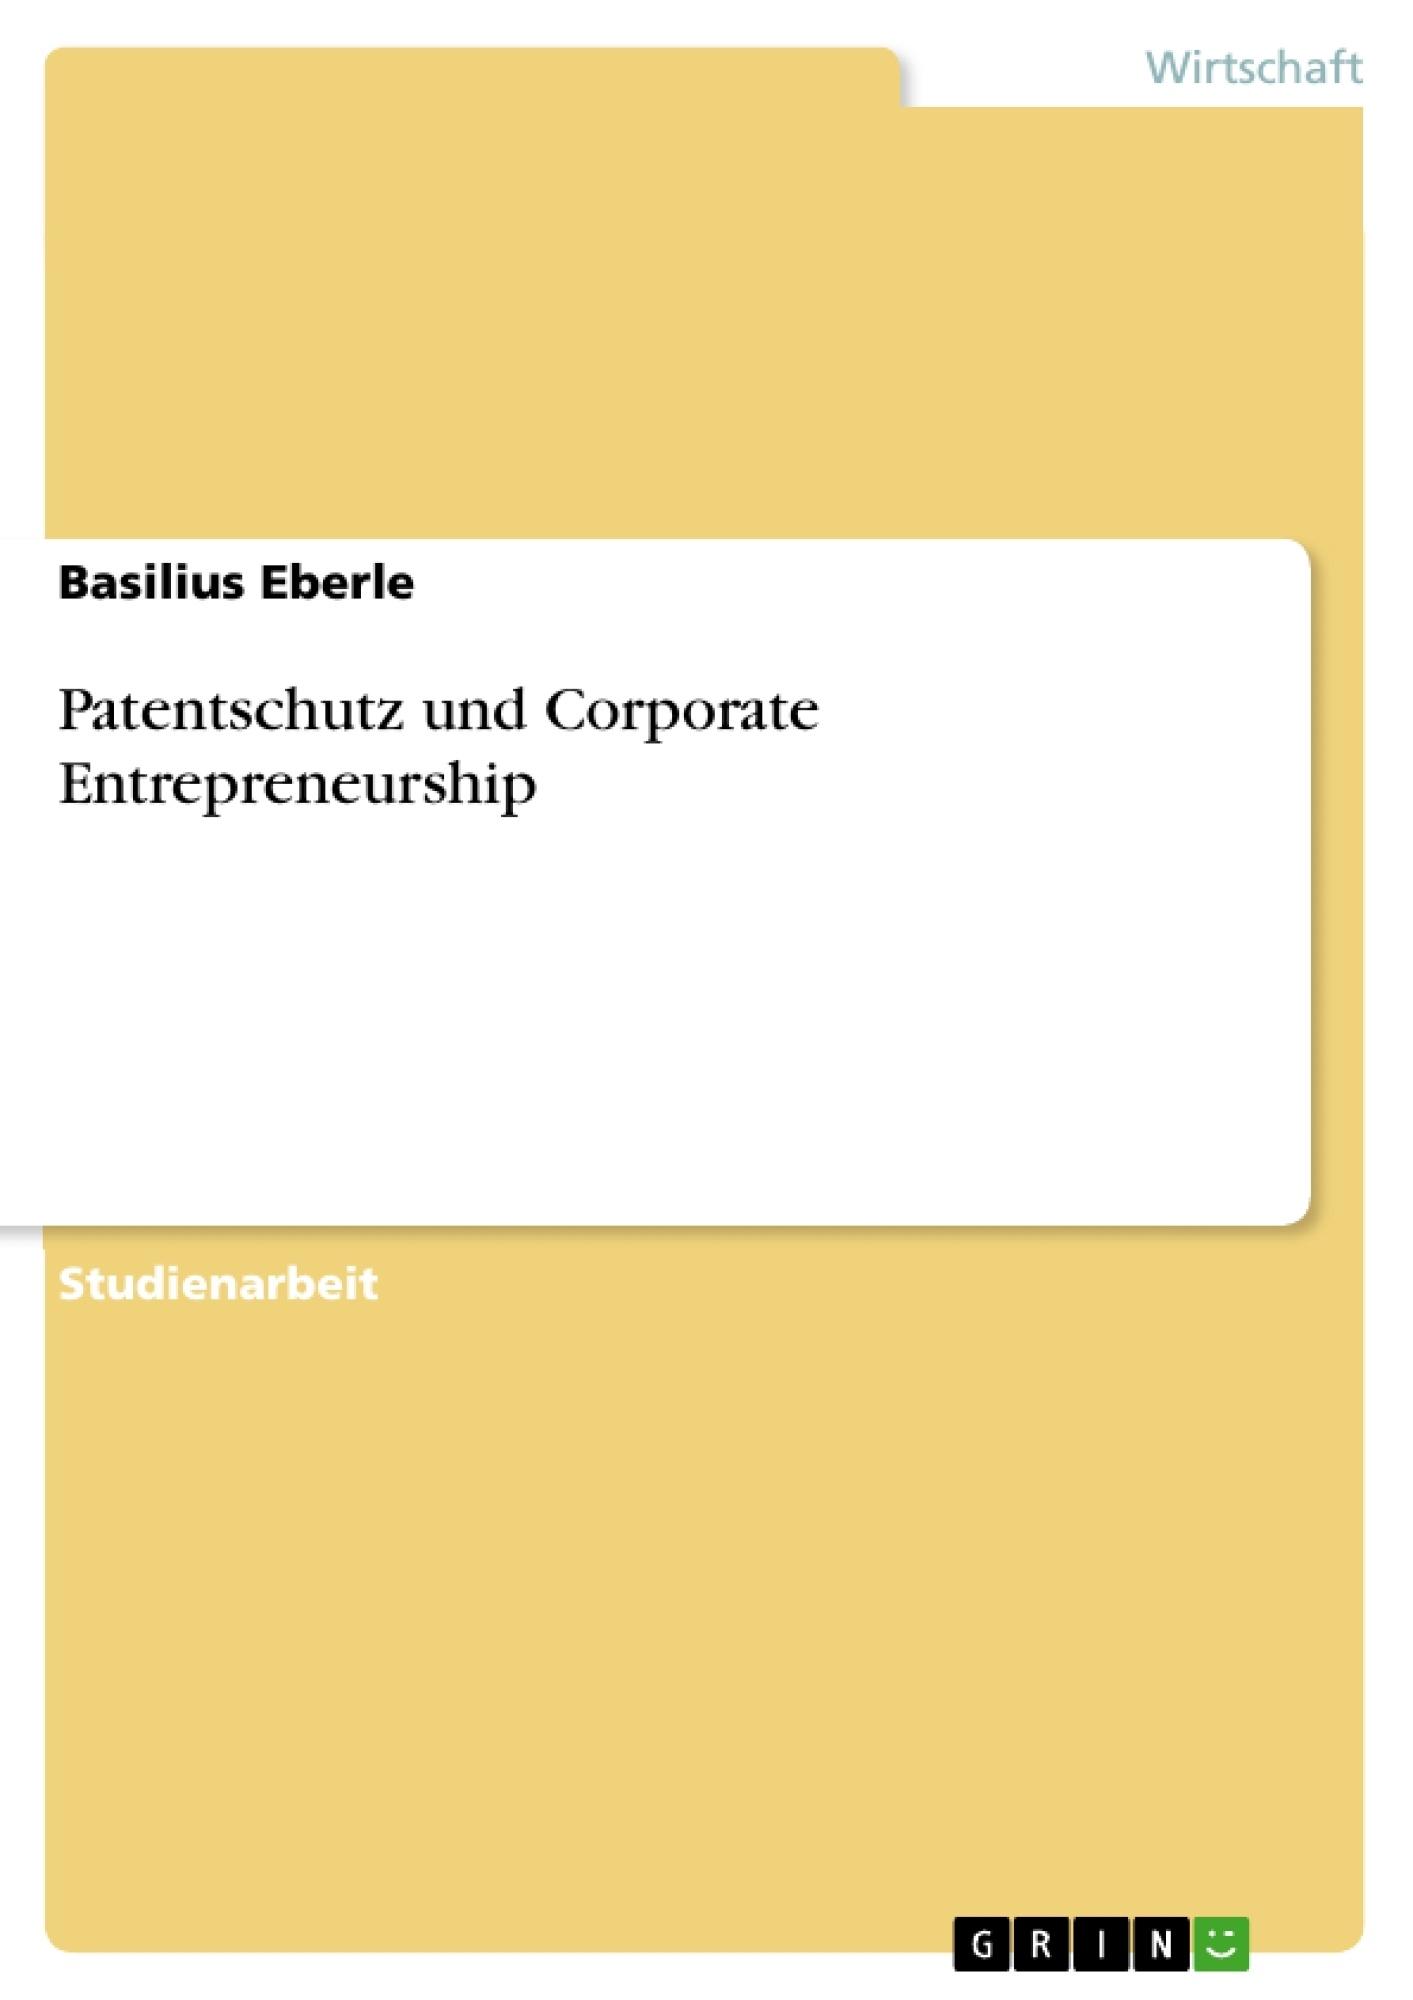 Titel: Patentschutz und Corporate Entrepreneurship